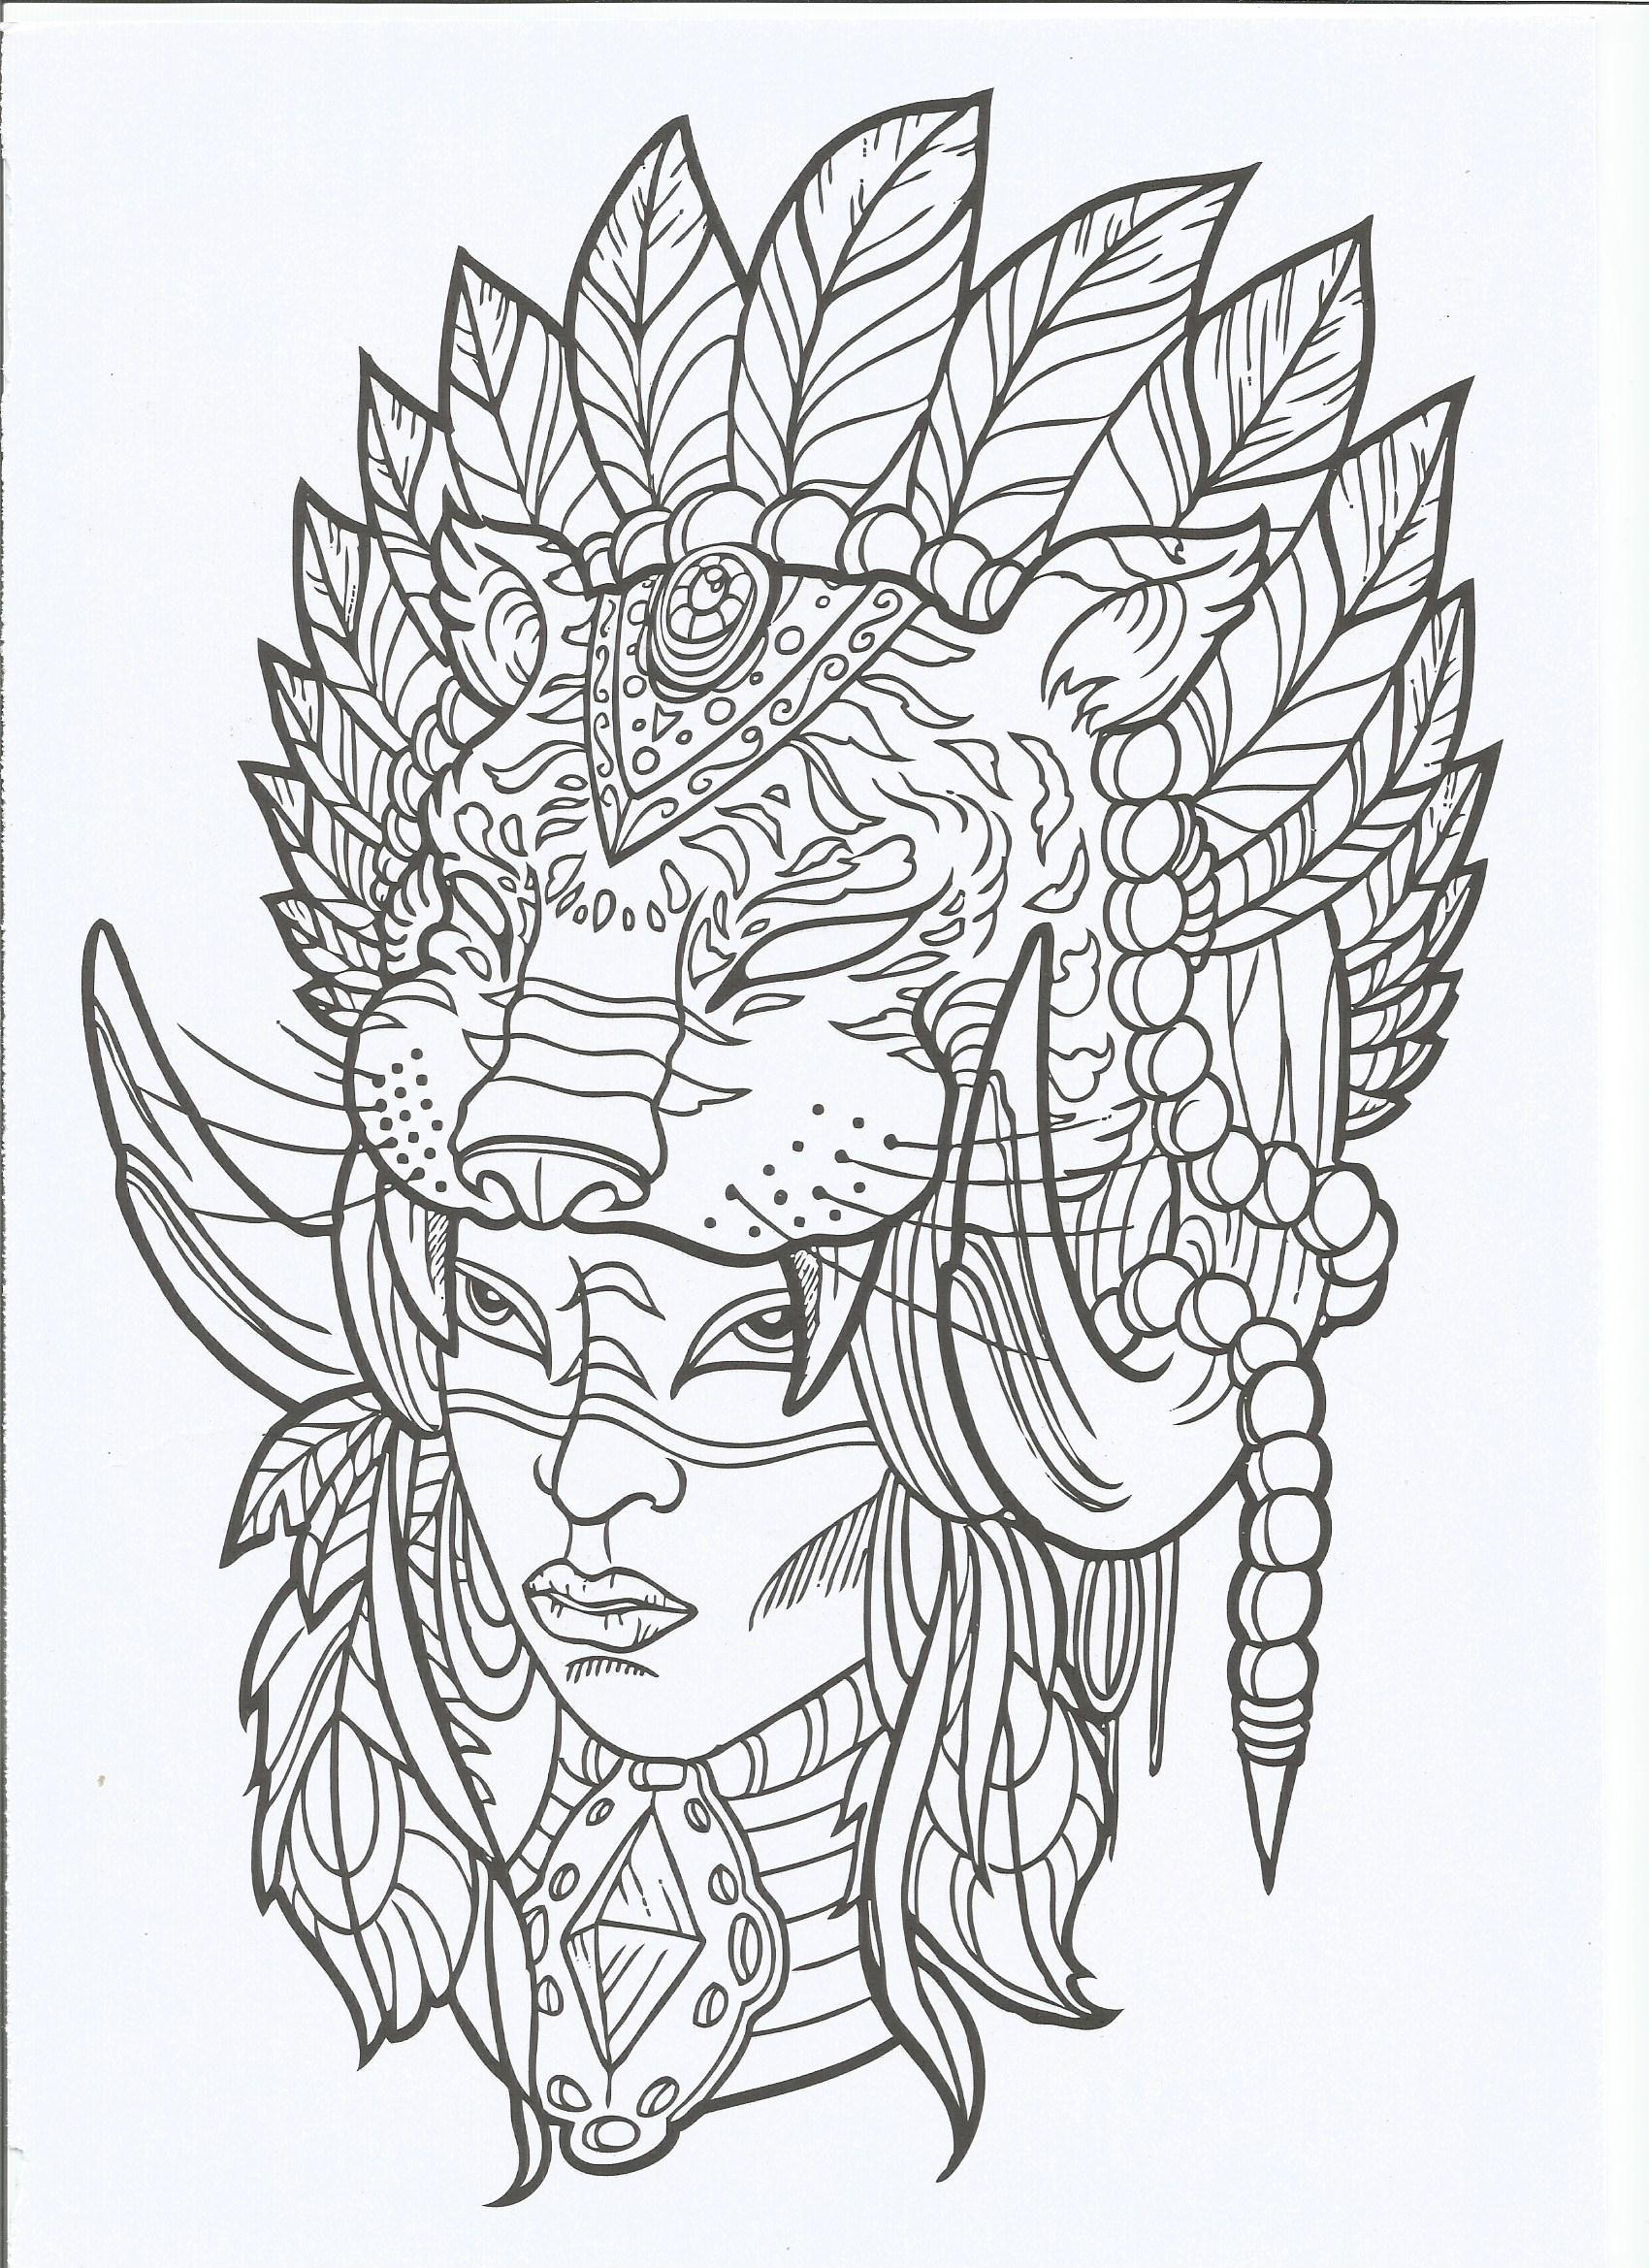 Pin By Diva De Aragao On Para Colorir Tattoo Coloring Book Coloring Book Art Designs Coloring Books